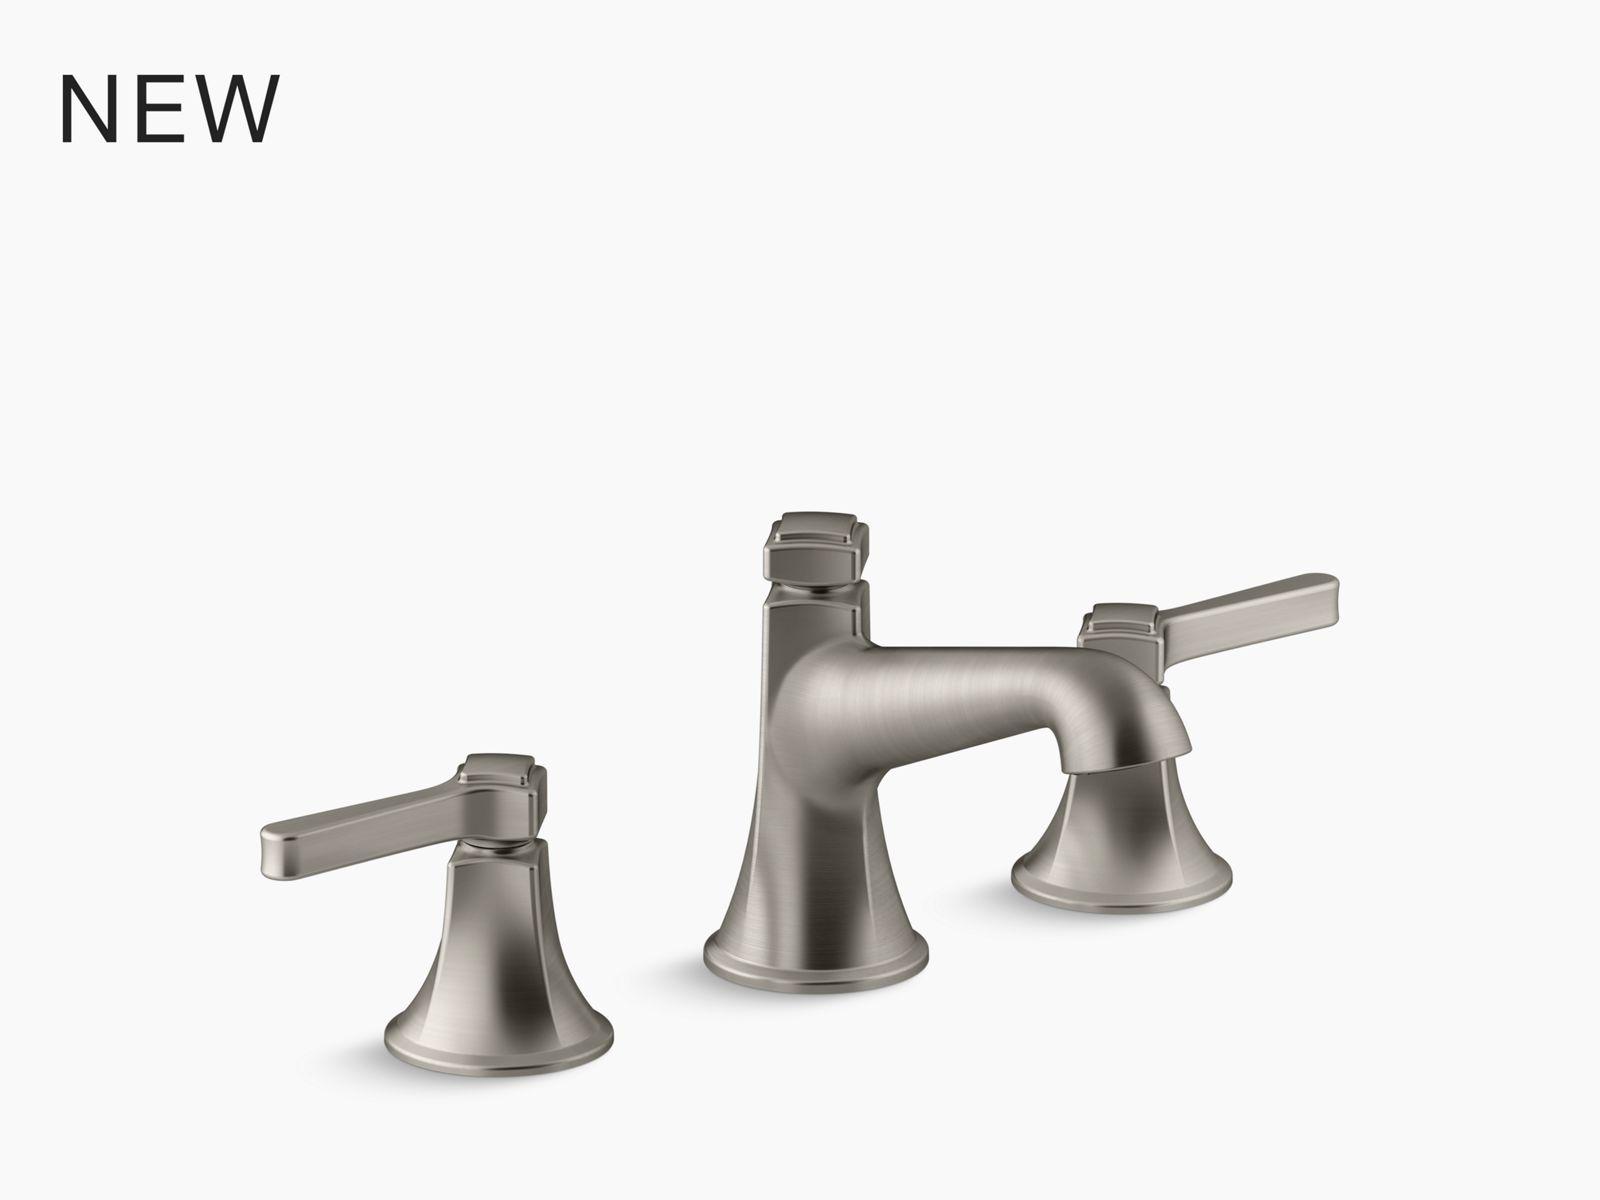 devonshire 24 pedestal bathroom sink with 8 widespread faucet holes